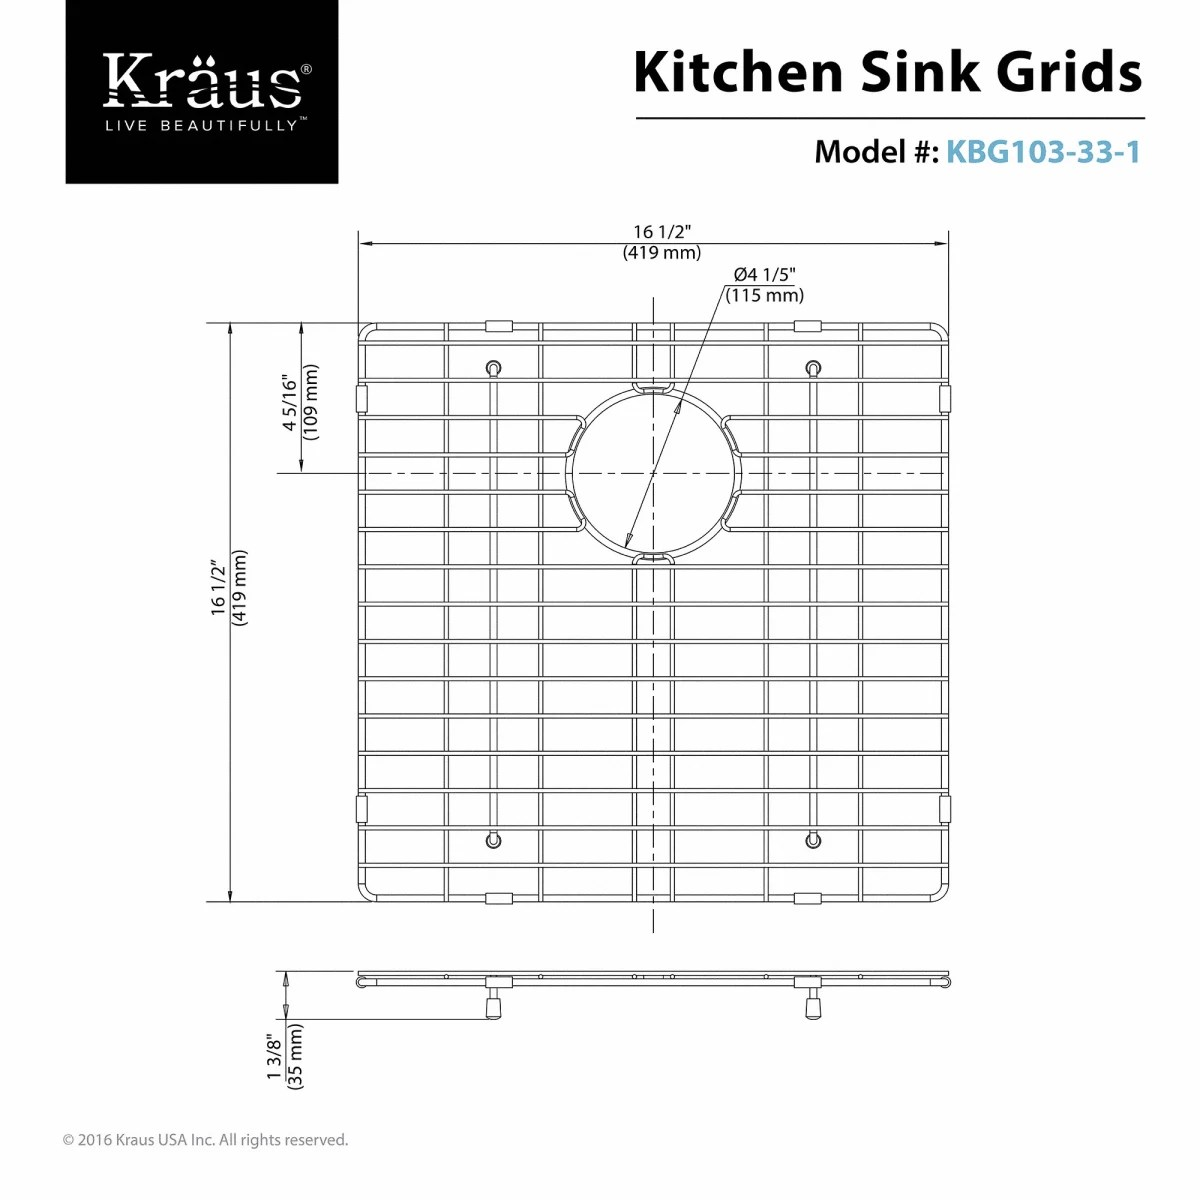 hight resolution of kraus kbg 103 33 1 stainless steel left bowl stainless steel bottom grid for kraus khu 103 33 1 kitchen sink faucet com